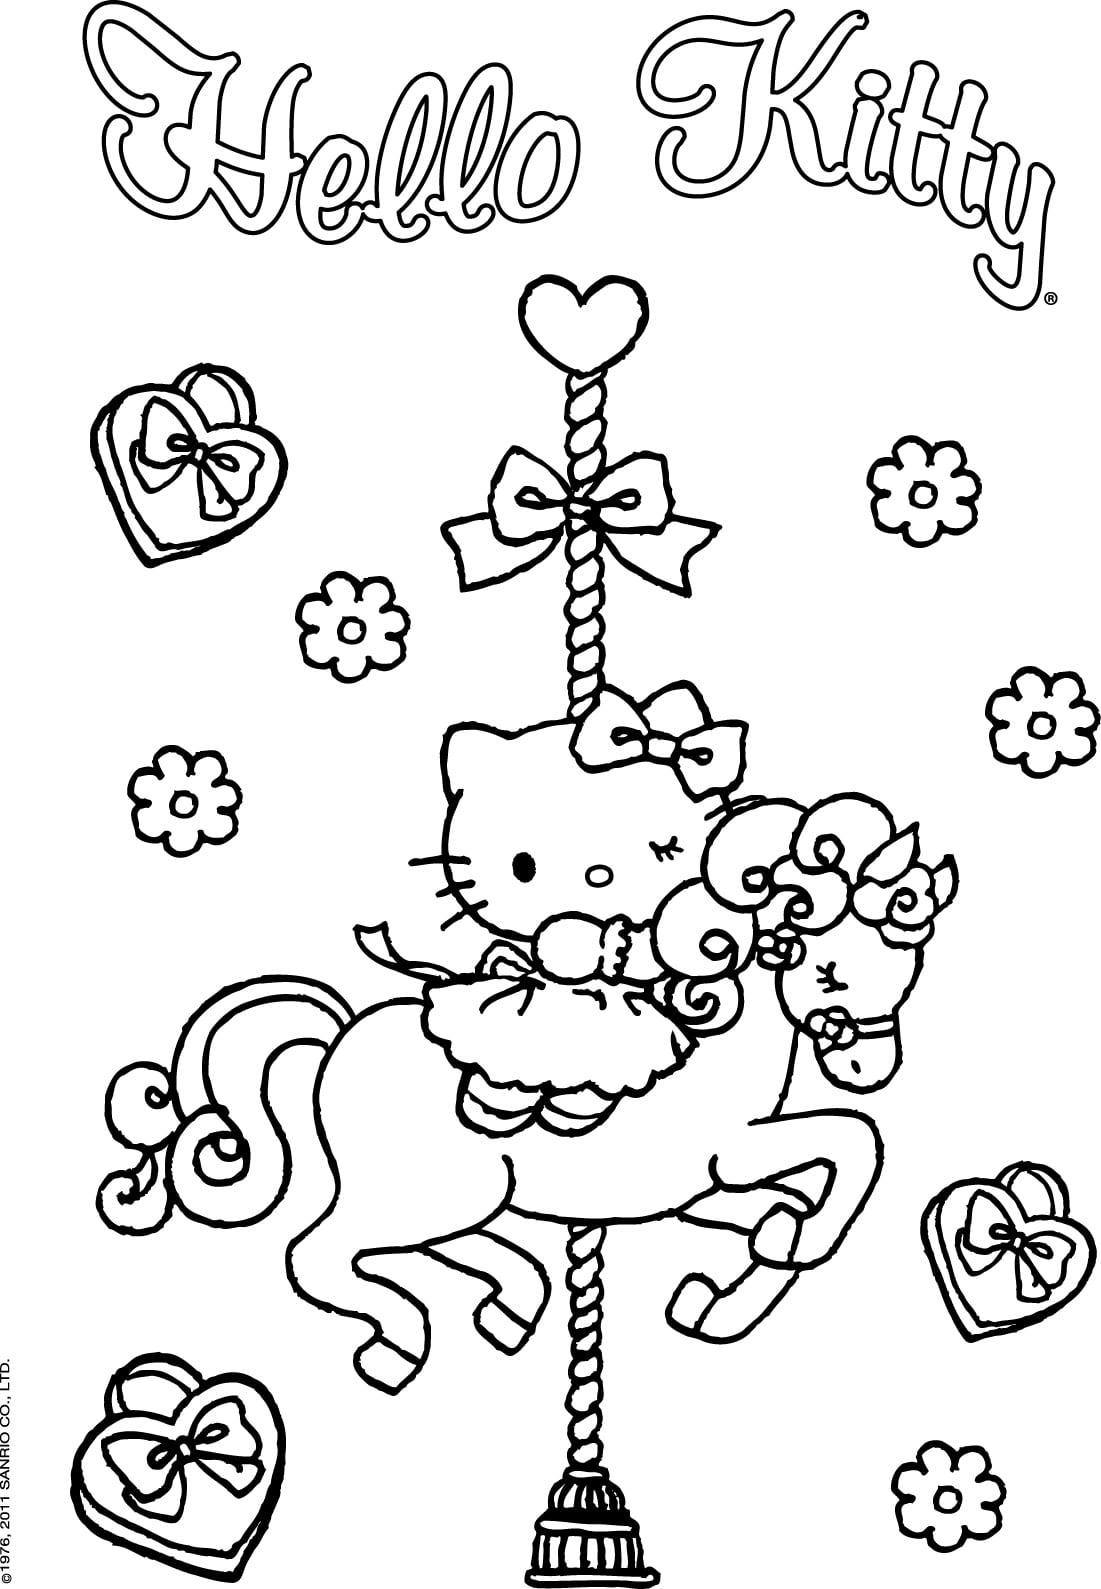 Desenho Da Hello Kitty Para Imprimir